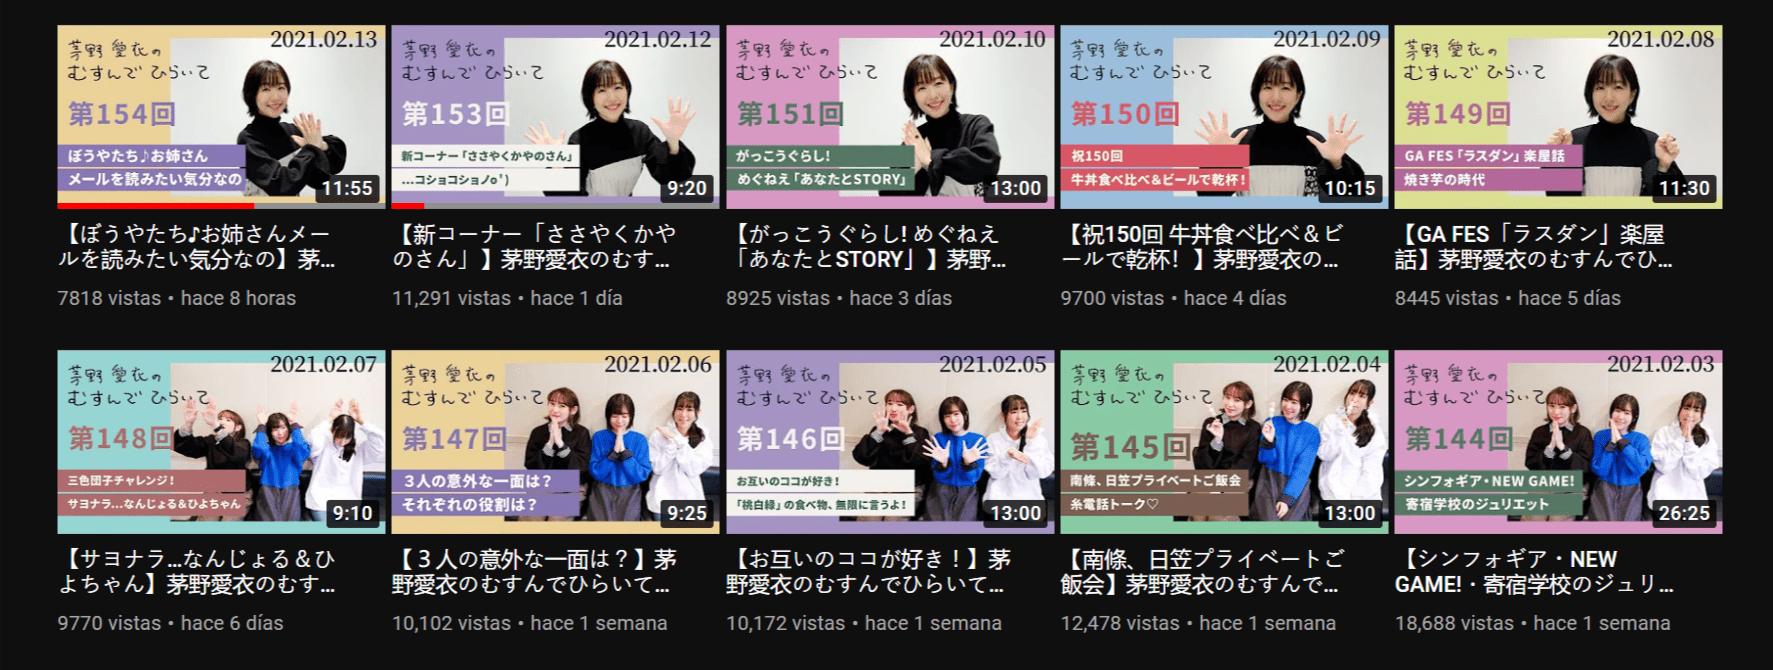 Ai Kayano Canal Youtube